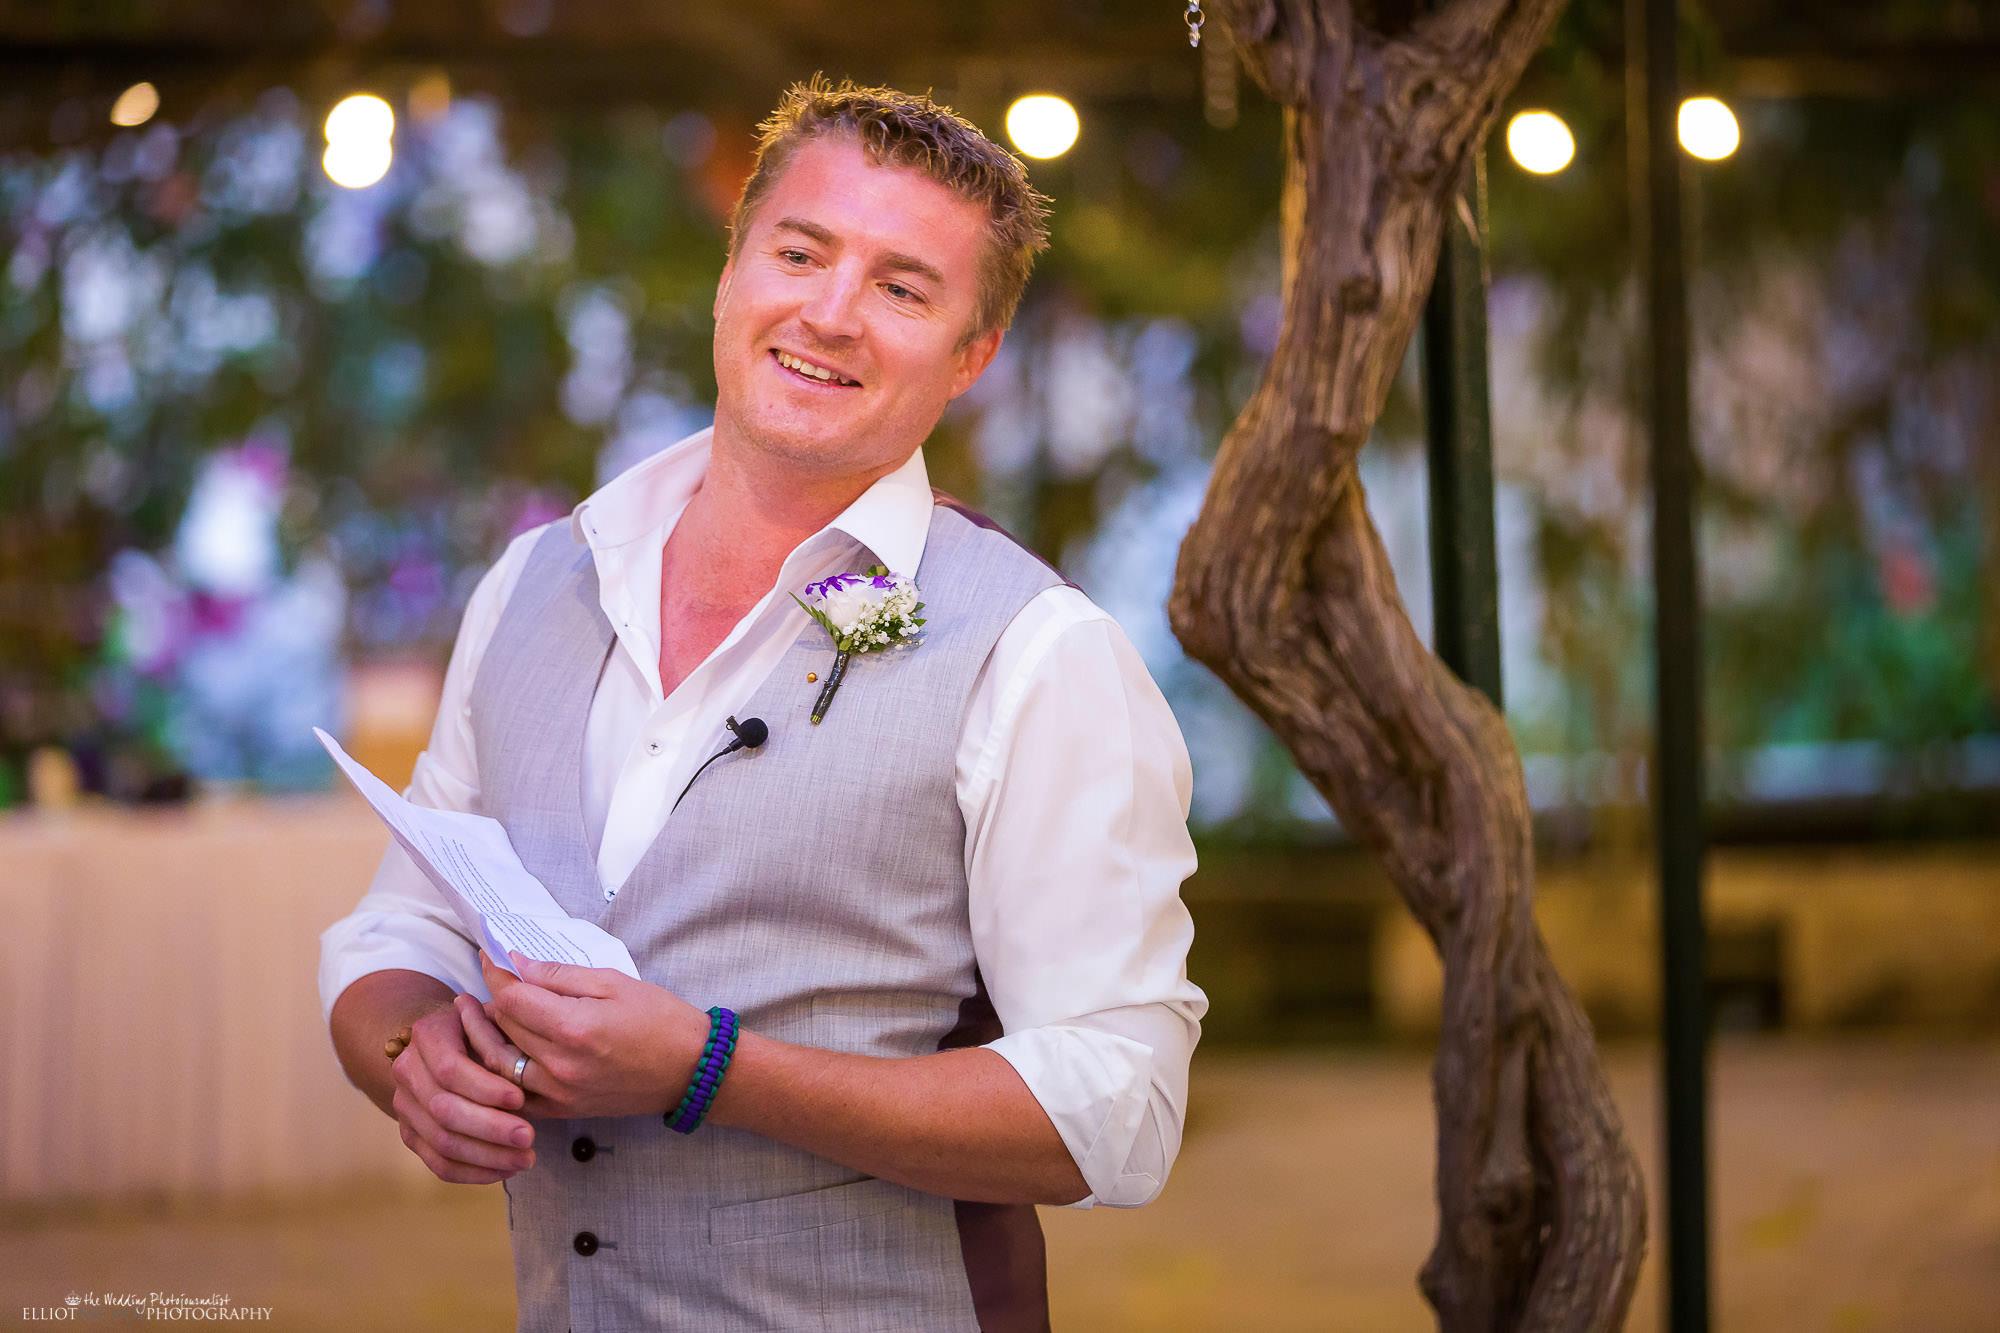 best-man-speech-wedding-reception-destination-wedding-UK-photographer-North-East